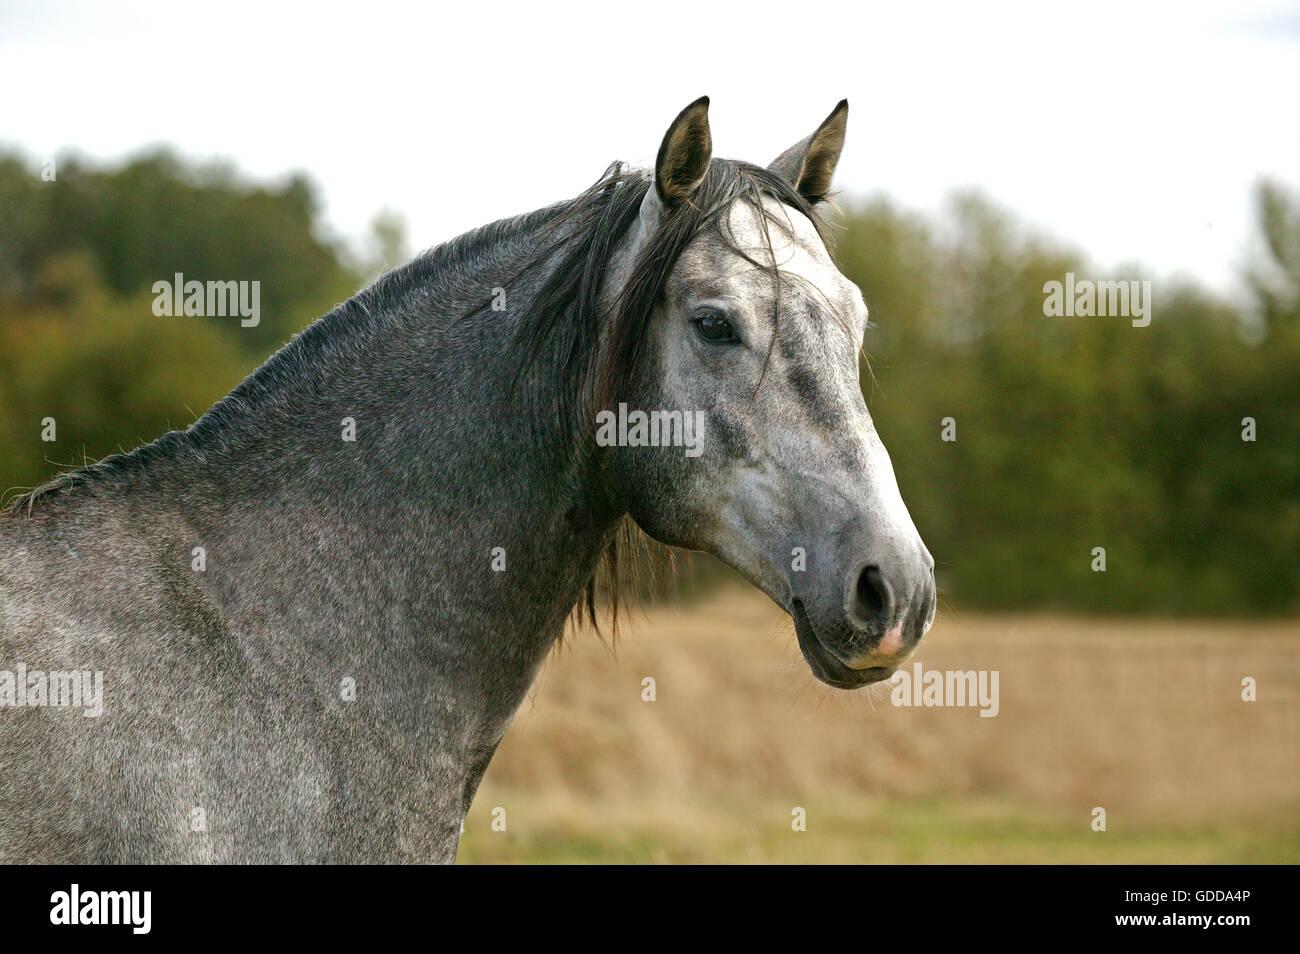 Lusitano Horse, Portrait of Stallion - Stock Image